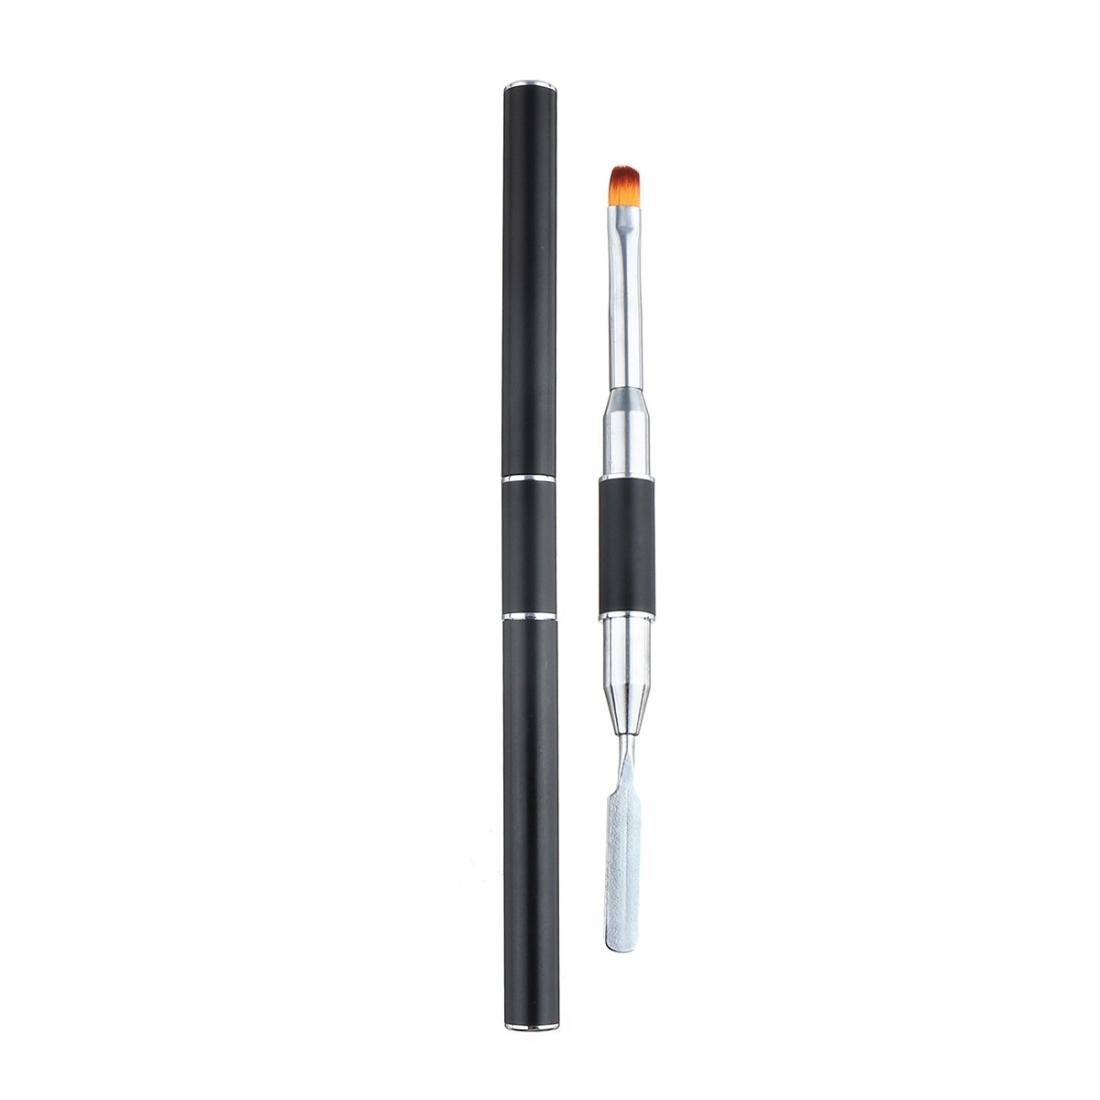 Dual Head Nail Art Acrylic UV Gel Extension Builder Drawing Brush Gel Polish Removal Spatula Stick Manicure Tool